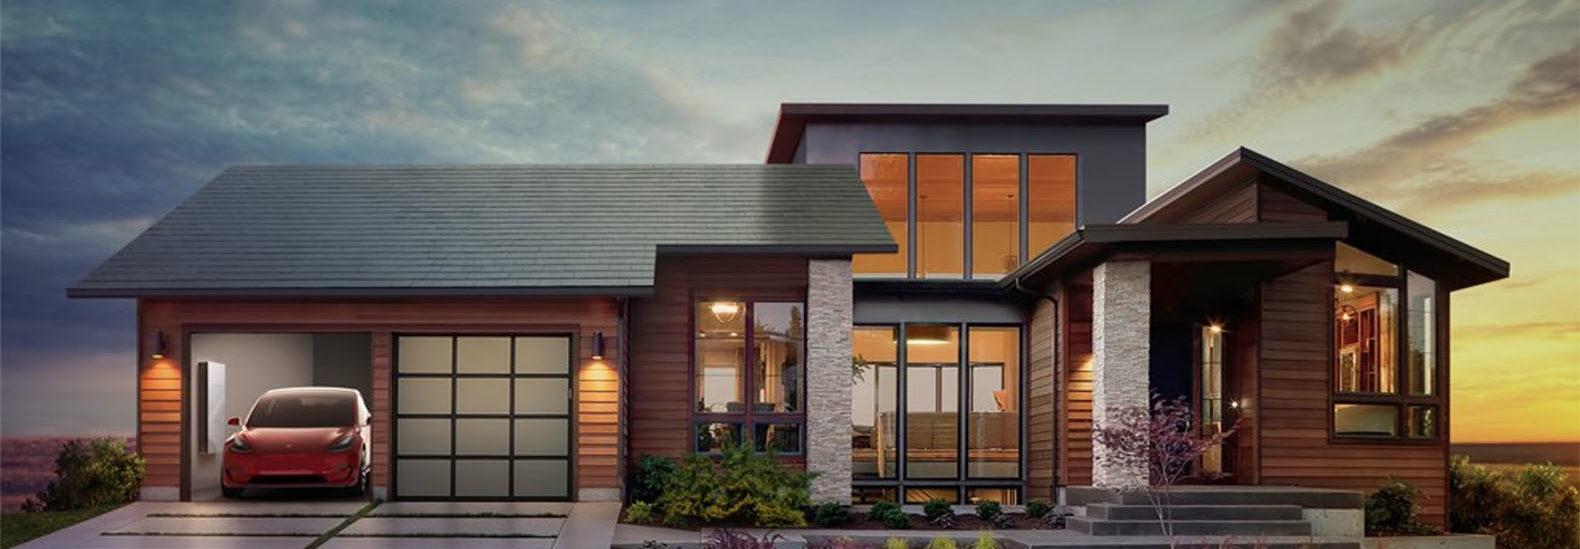 Tesla's new solar roof